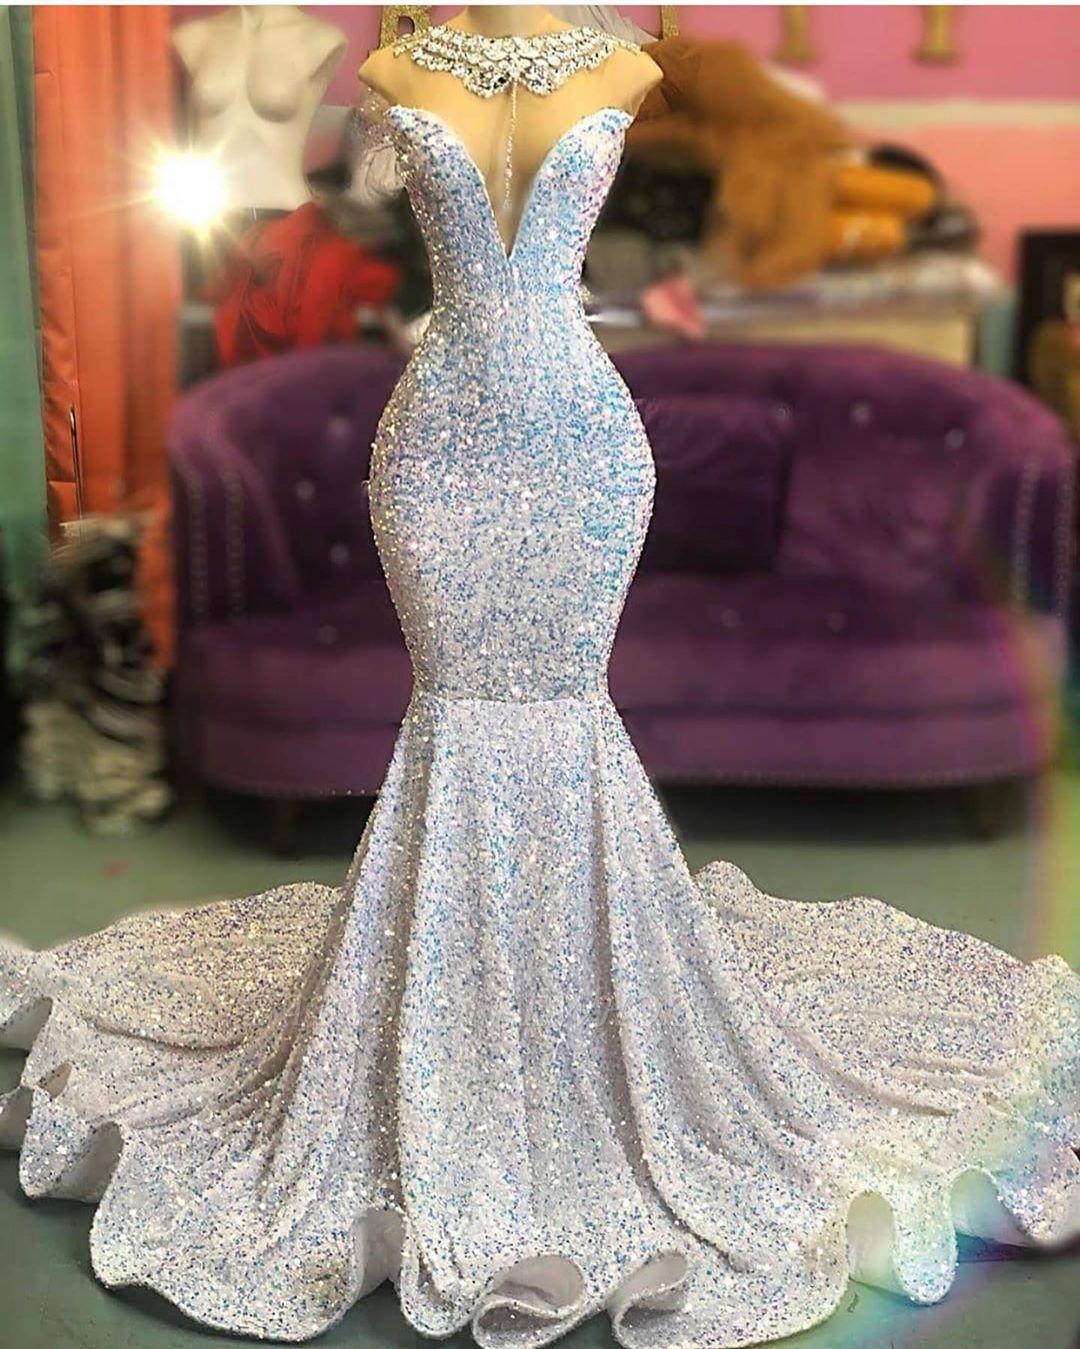 Moda Querida Sereia Brilho Lantejoulas Vestidos de noite